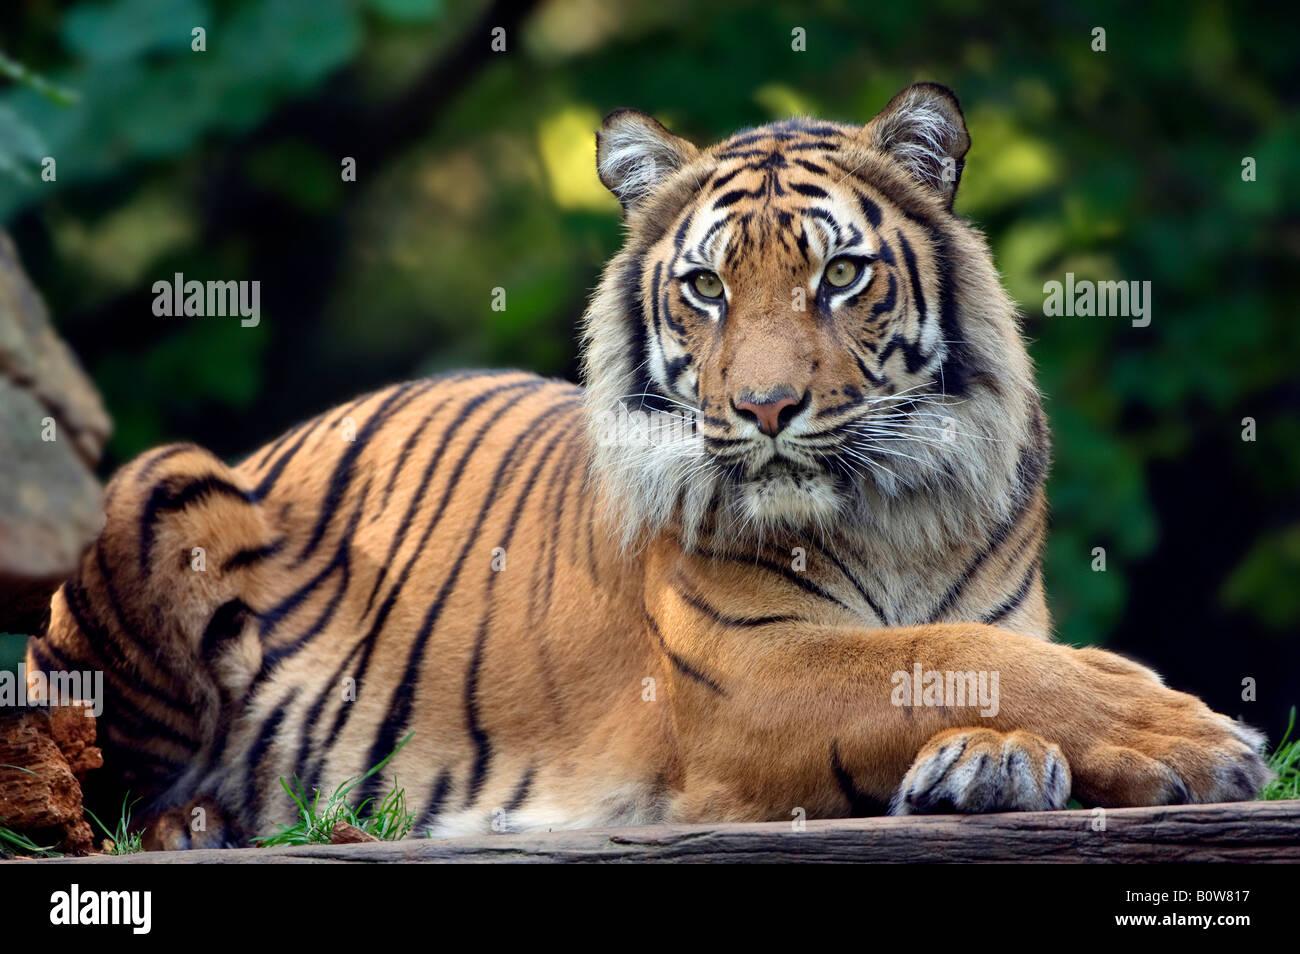 Tigre de Sumatra (Panthera tigris sumatrae) Imagen De Stock